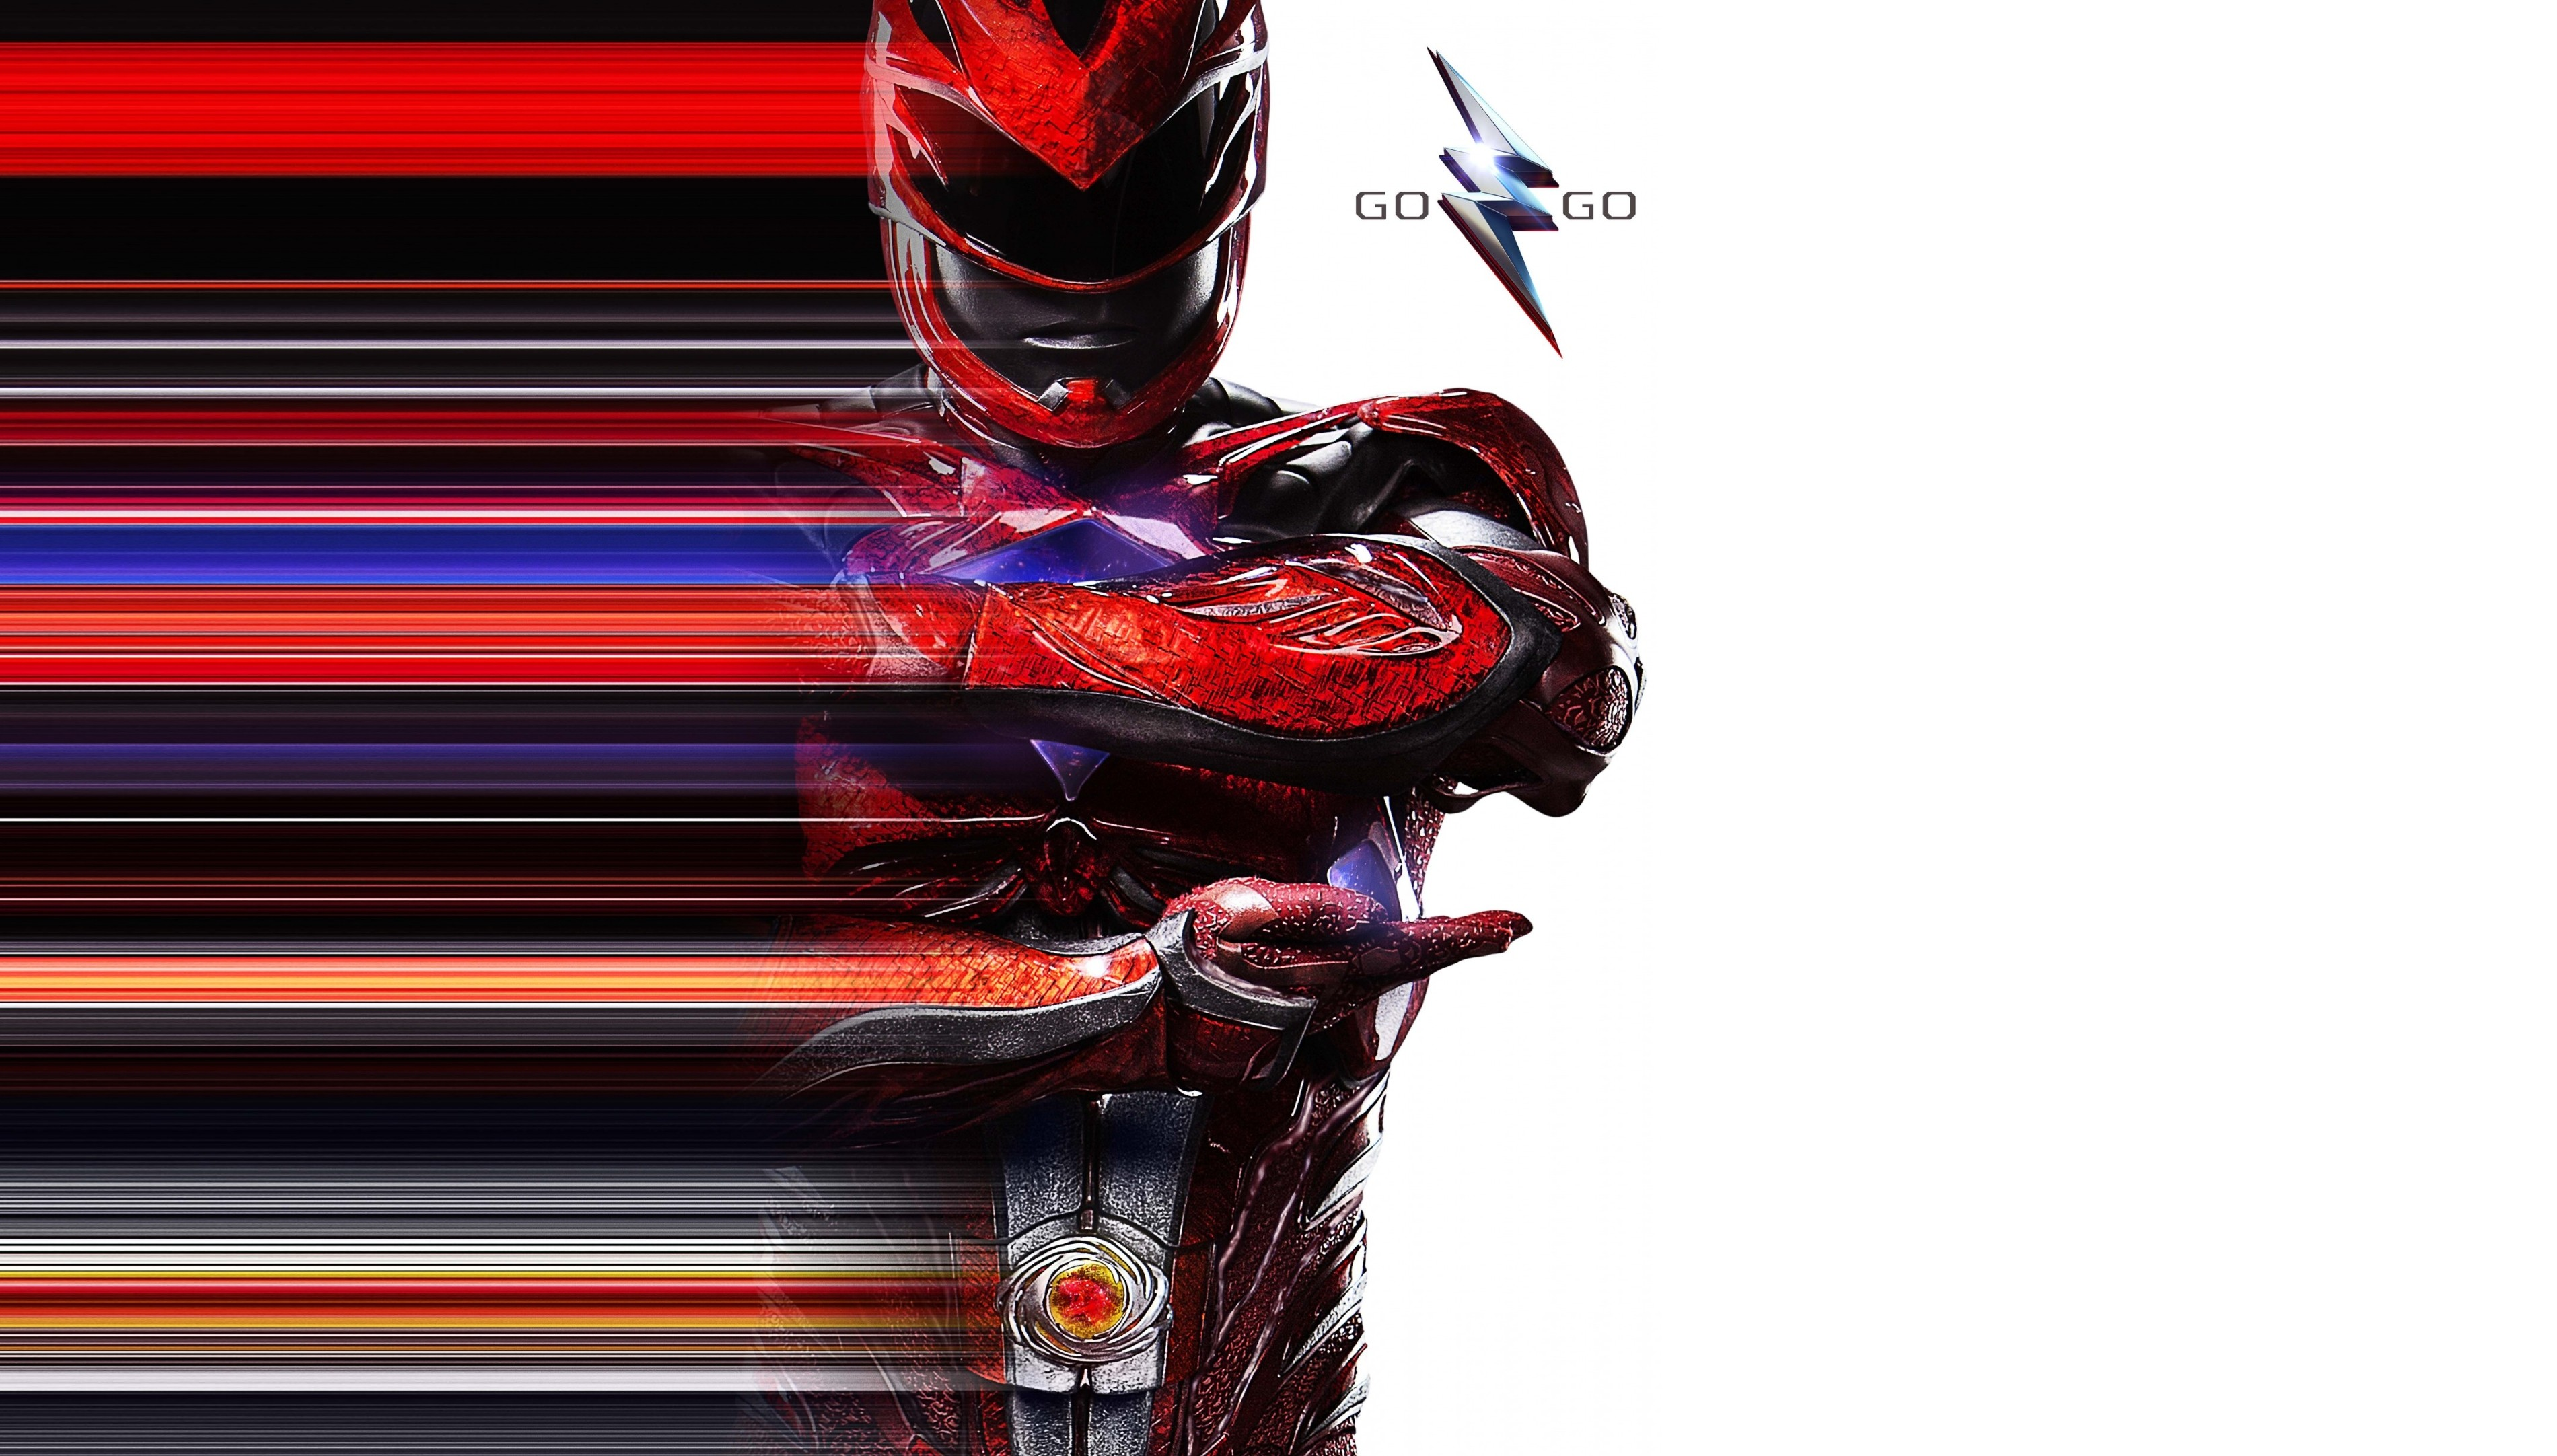 Download Wallpaper Mac Superhero - power-rangers-3800x2164-red-dacre-montgomery-jason-lee-scott-superhero-12173  Pic_49421.jpg